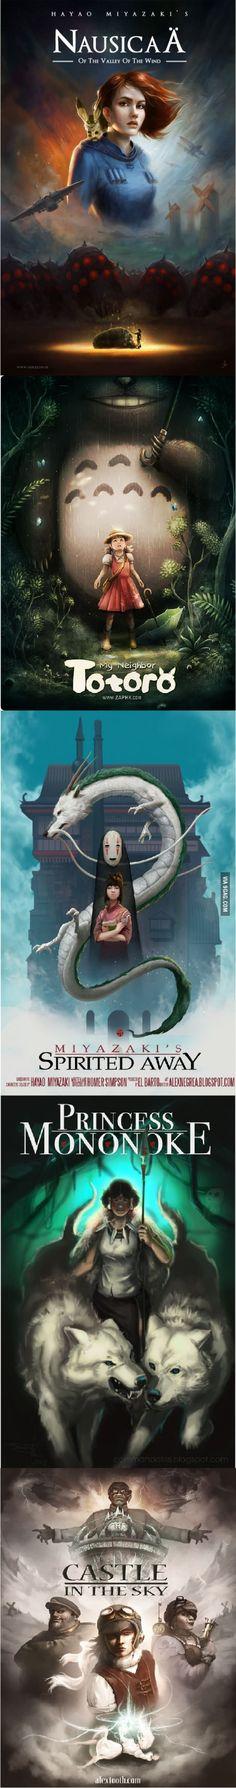 Realistic Miyazaki Posters